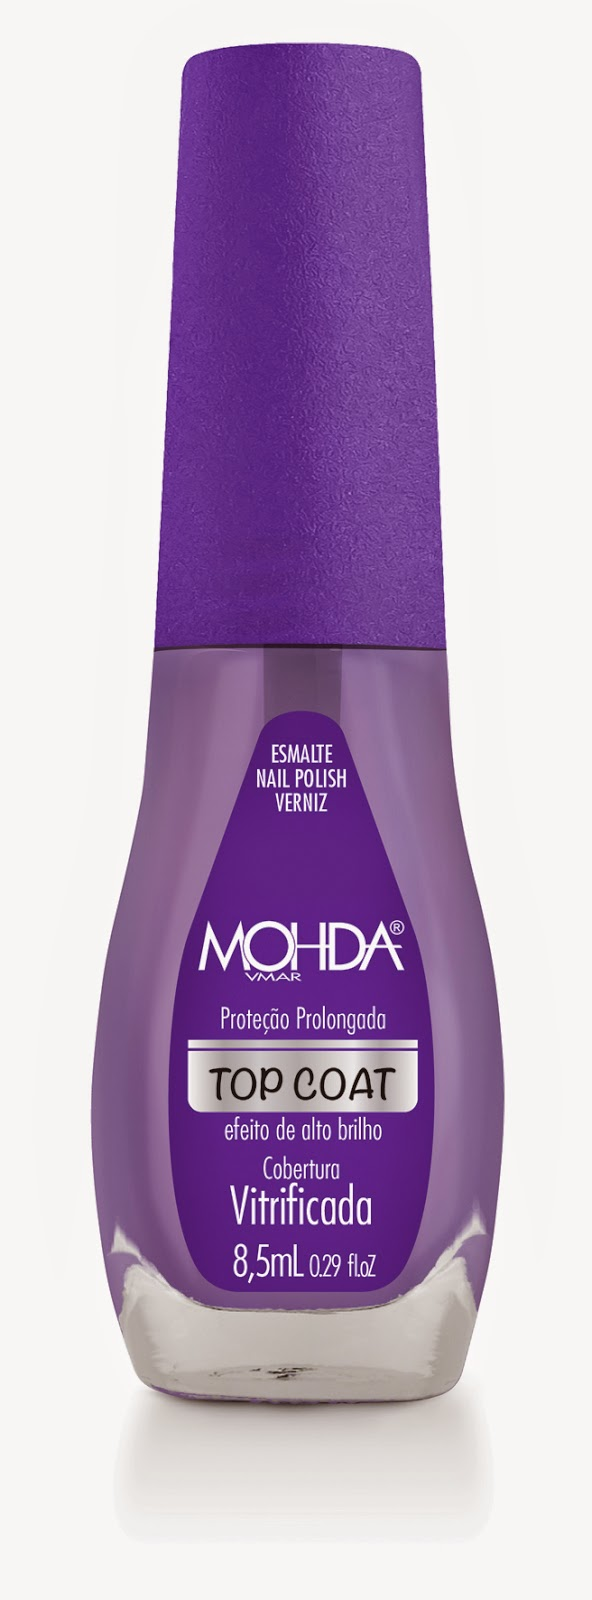 Top Coat Cobertura Vitrificada Mohda